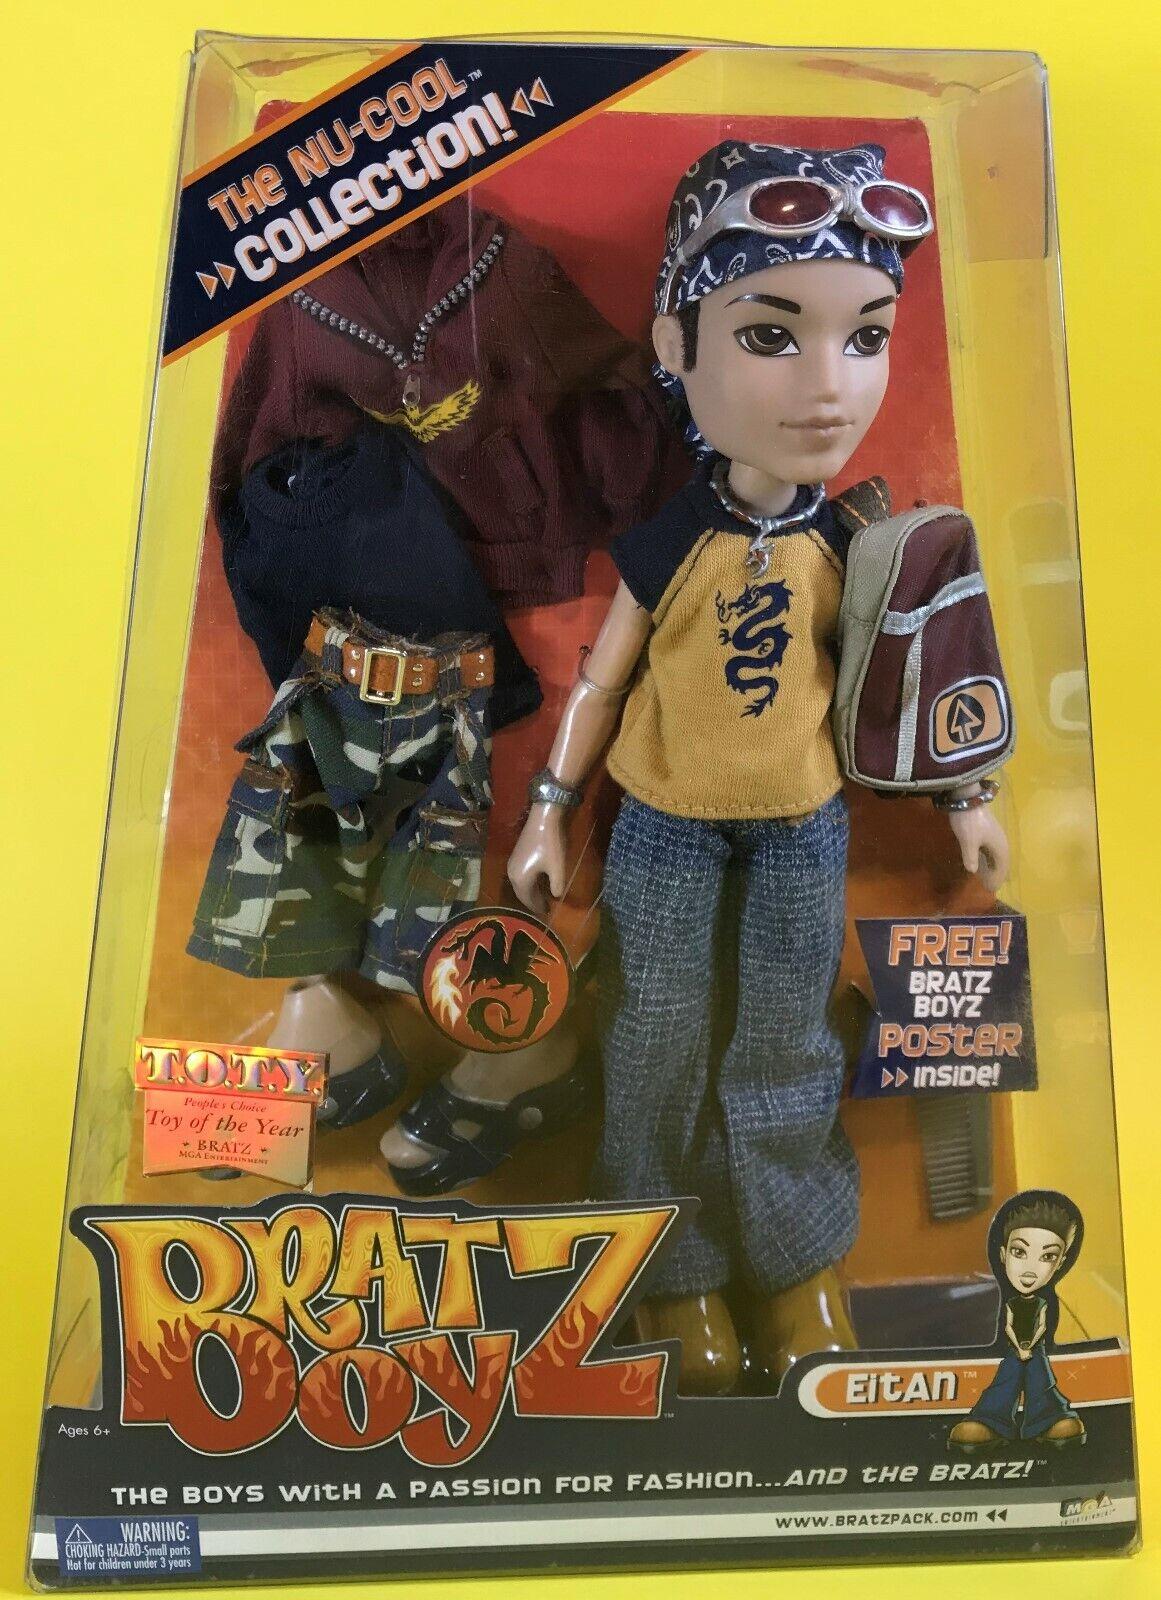 2003 MGA BRATZ BOYZ BOY EITAN DOLL w CLOTHES schuhe OUTFIT FASHIONS BRATS BOYS